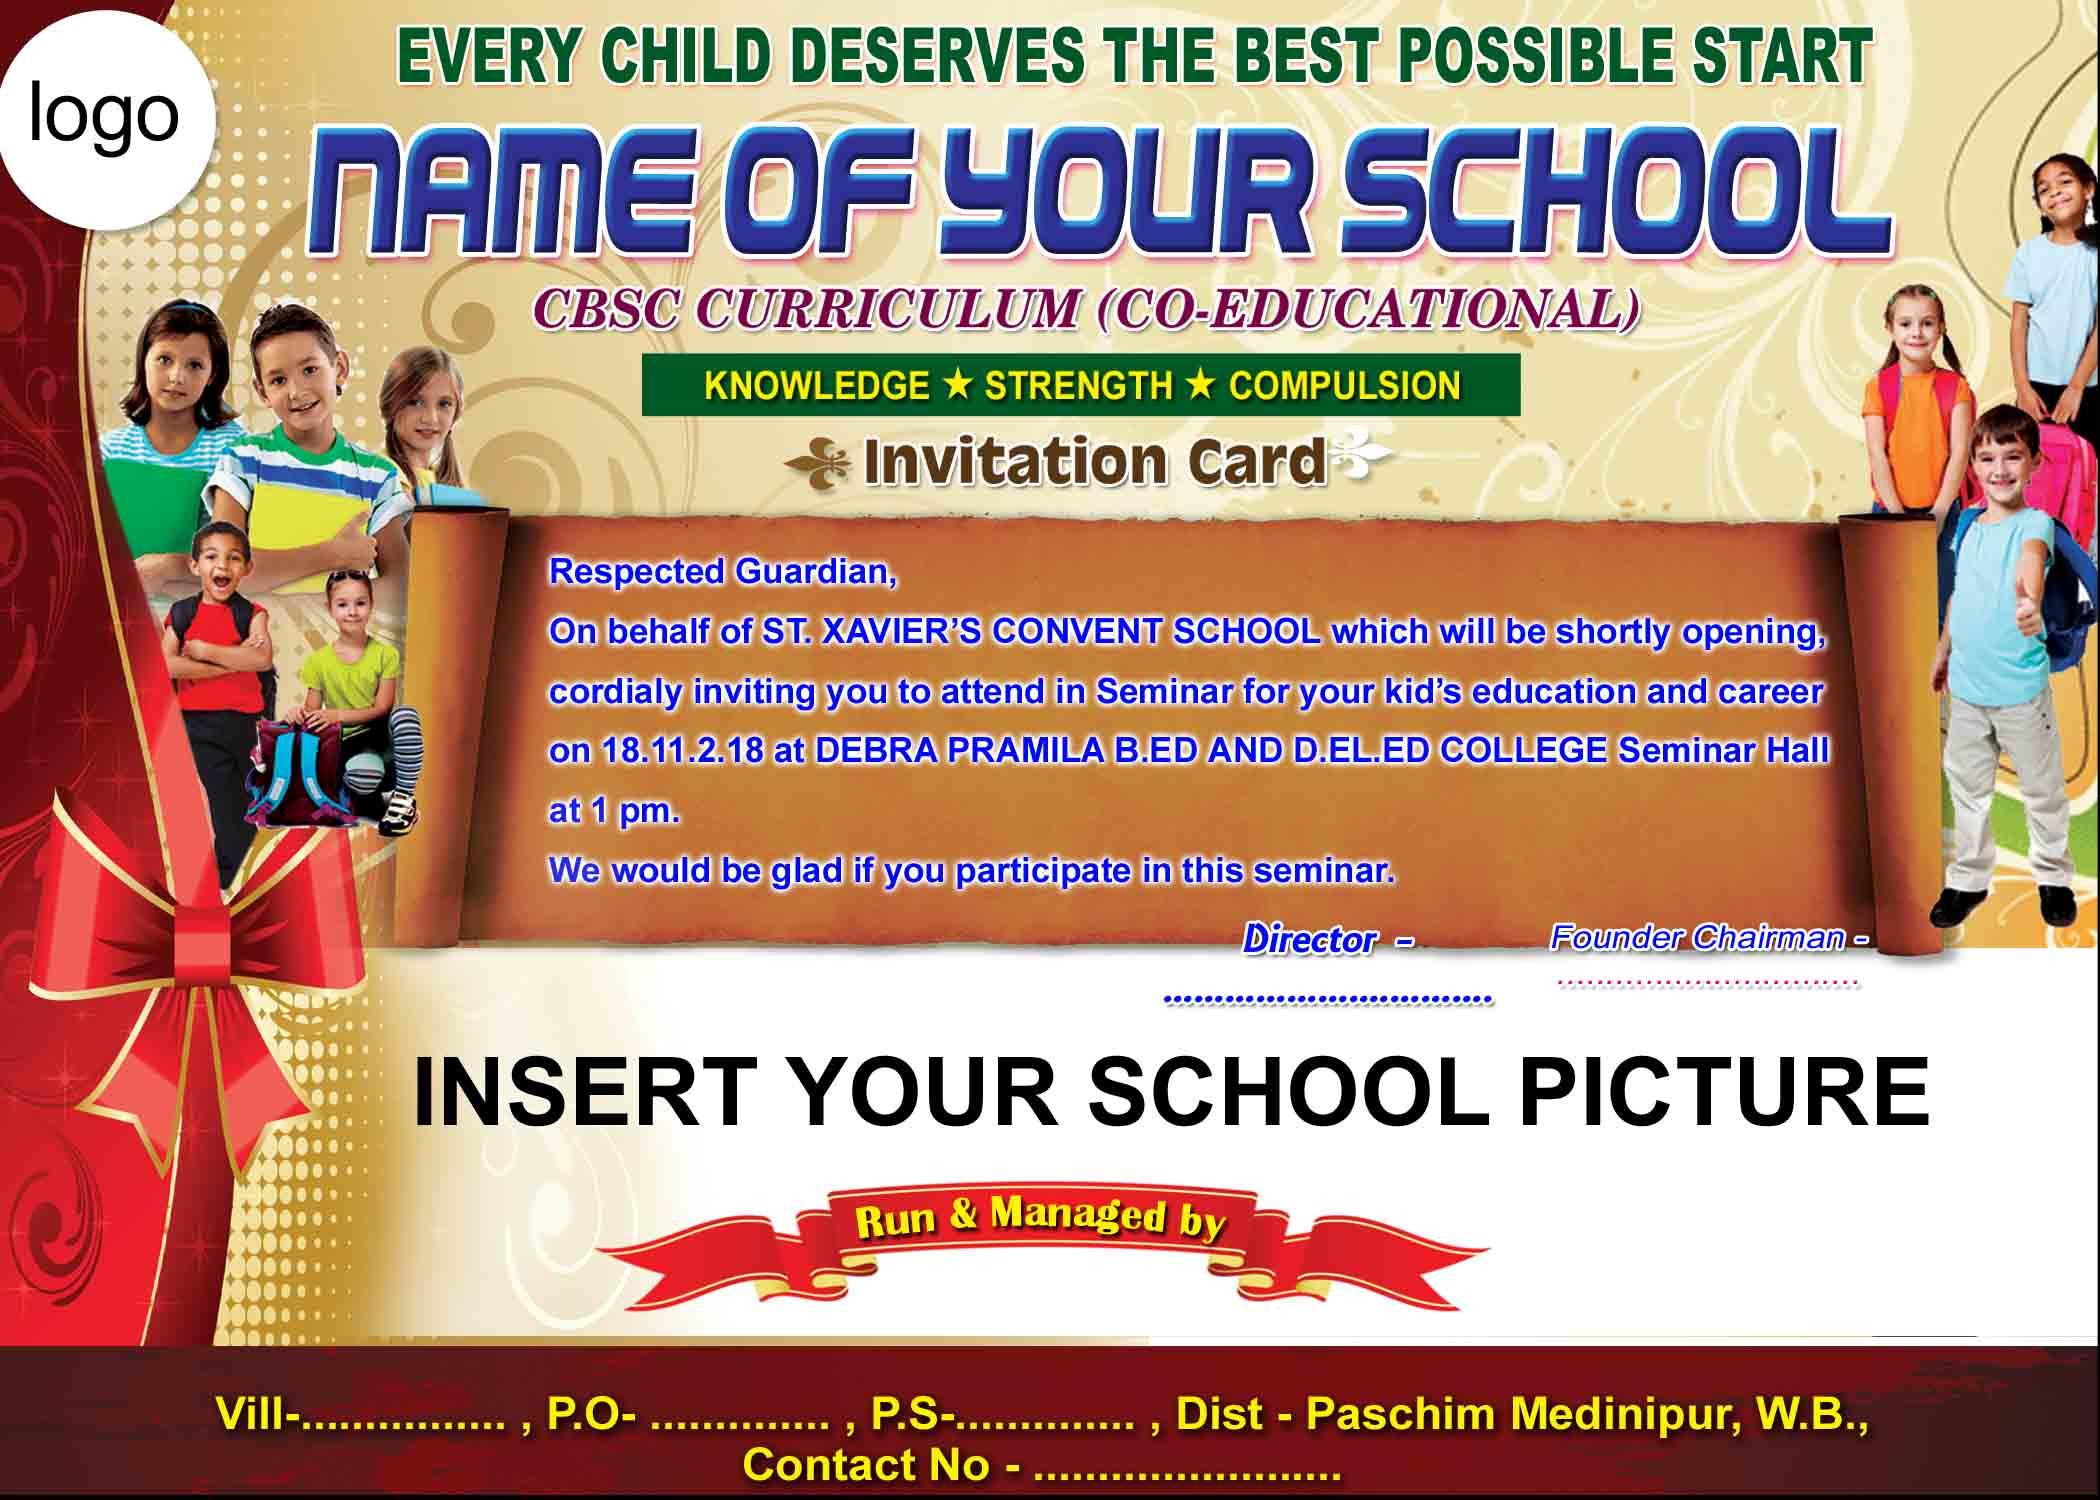 SIMPLE SCHOOL INVITATION CARD